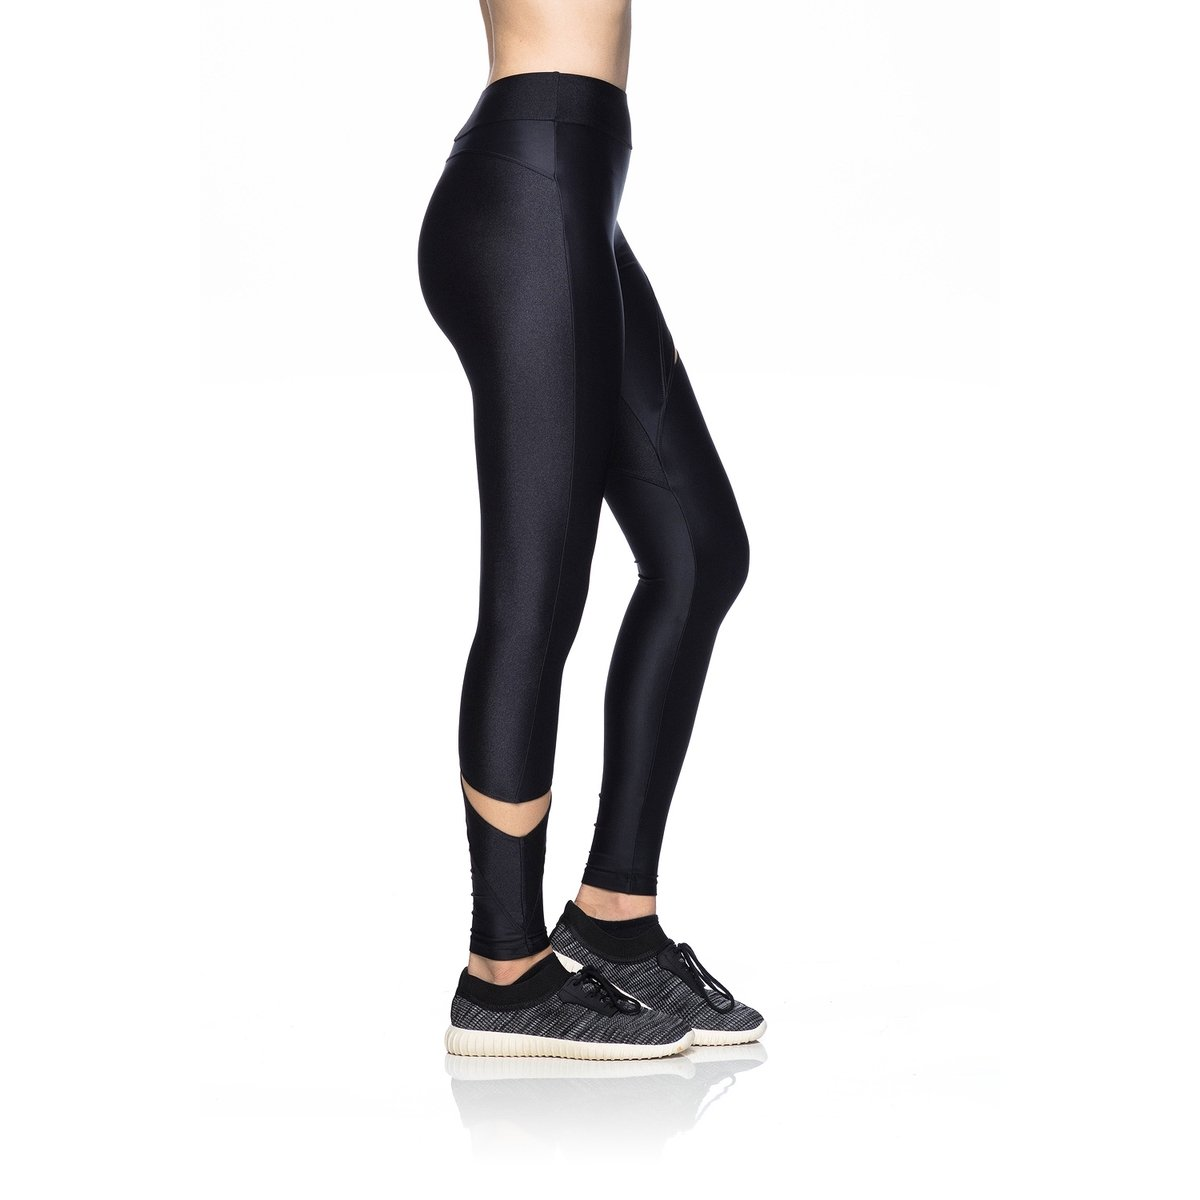 Tule Elástica Fitness Mulher Legging Transp Fitness Preto Legging npgqzEIX